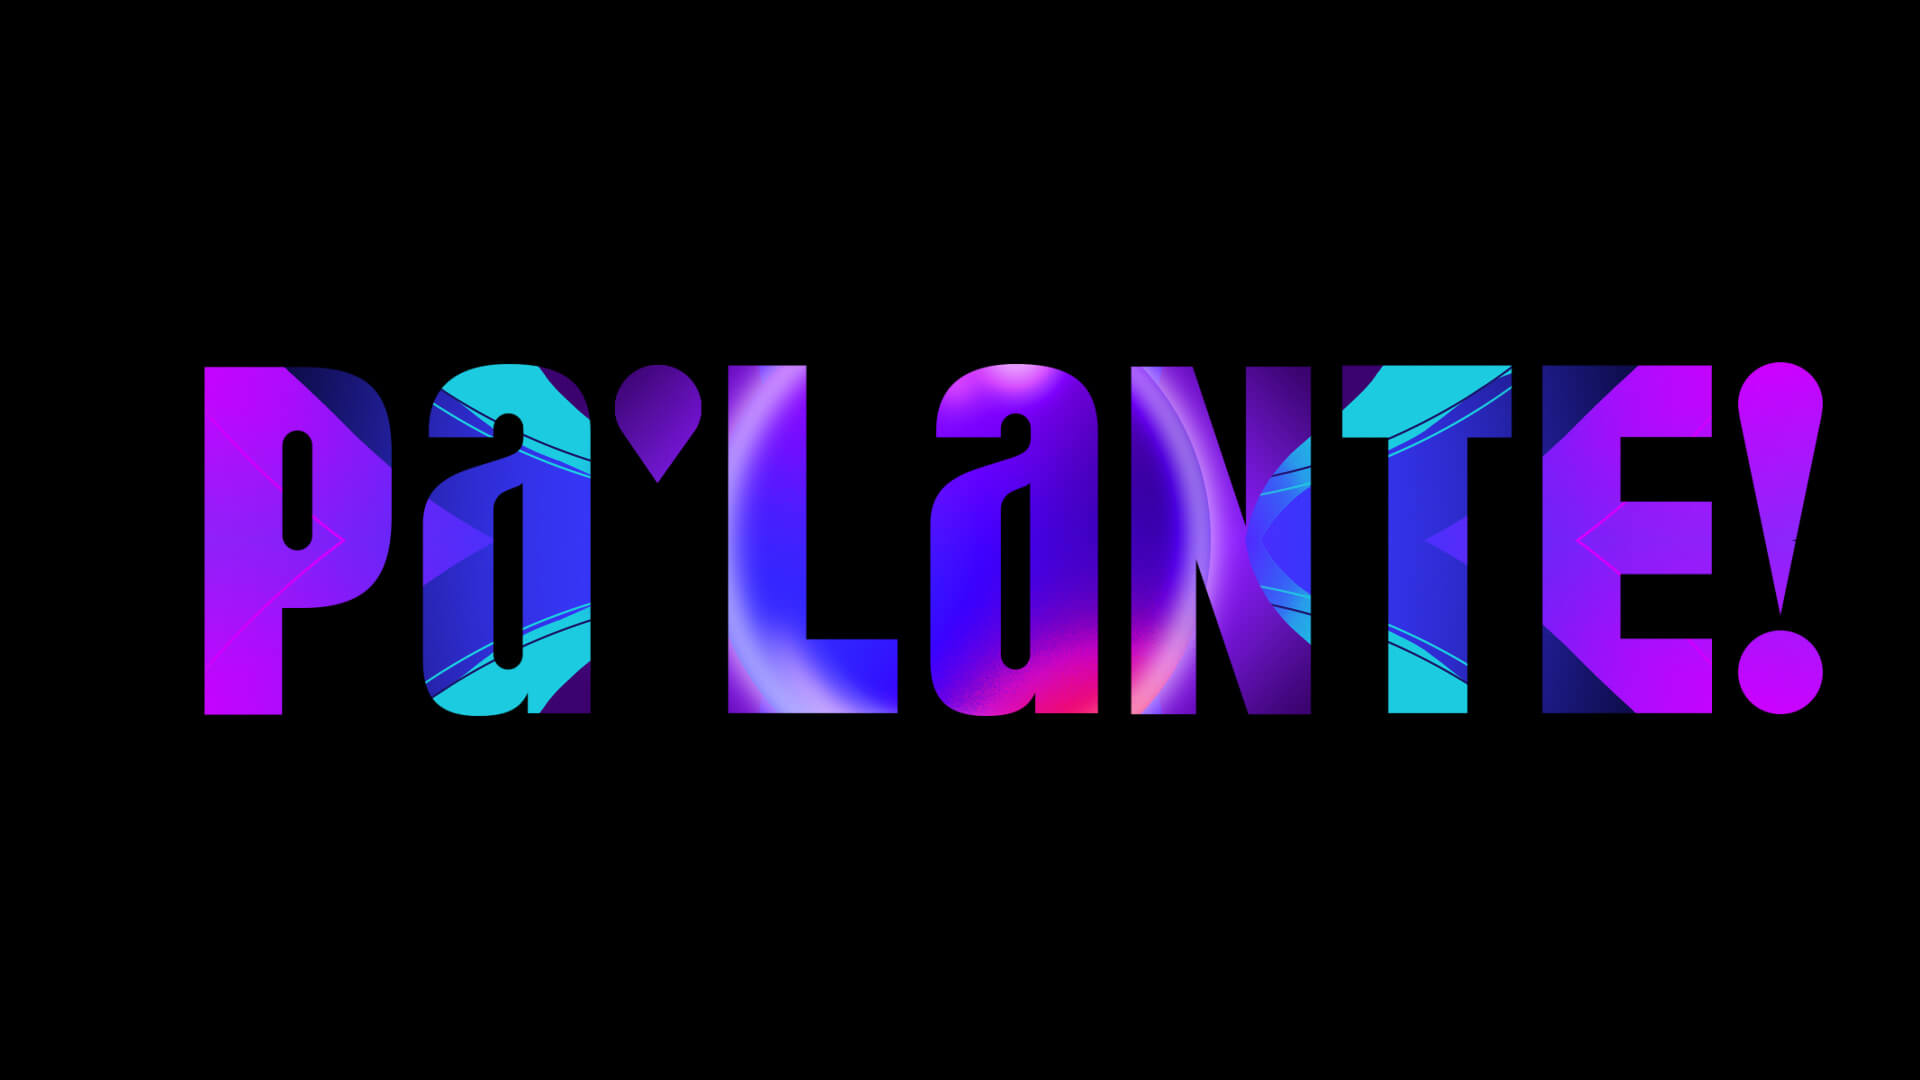 Palante_LogoTreatment_v02-2020-08-25